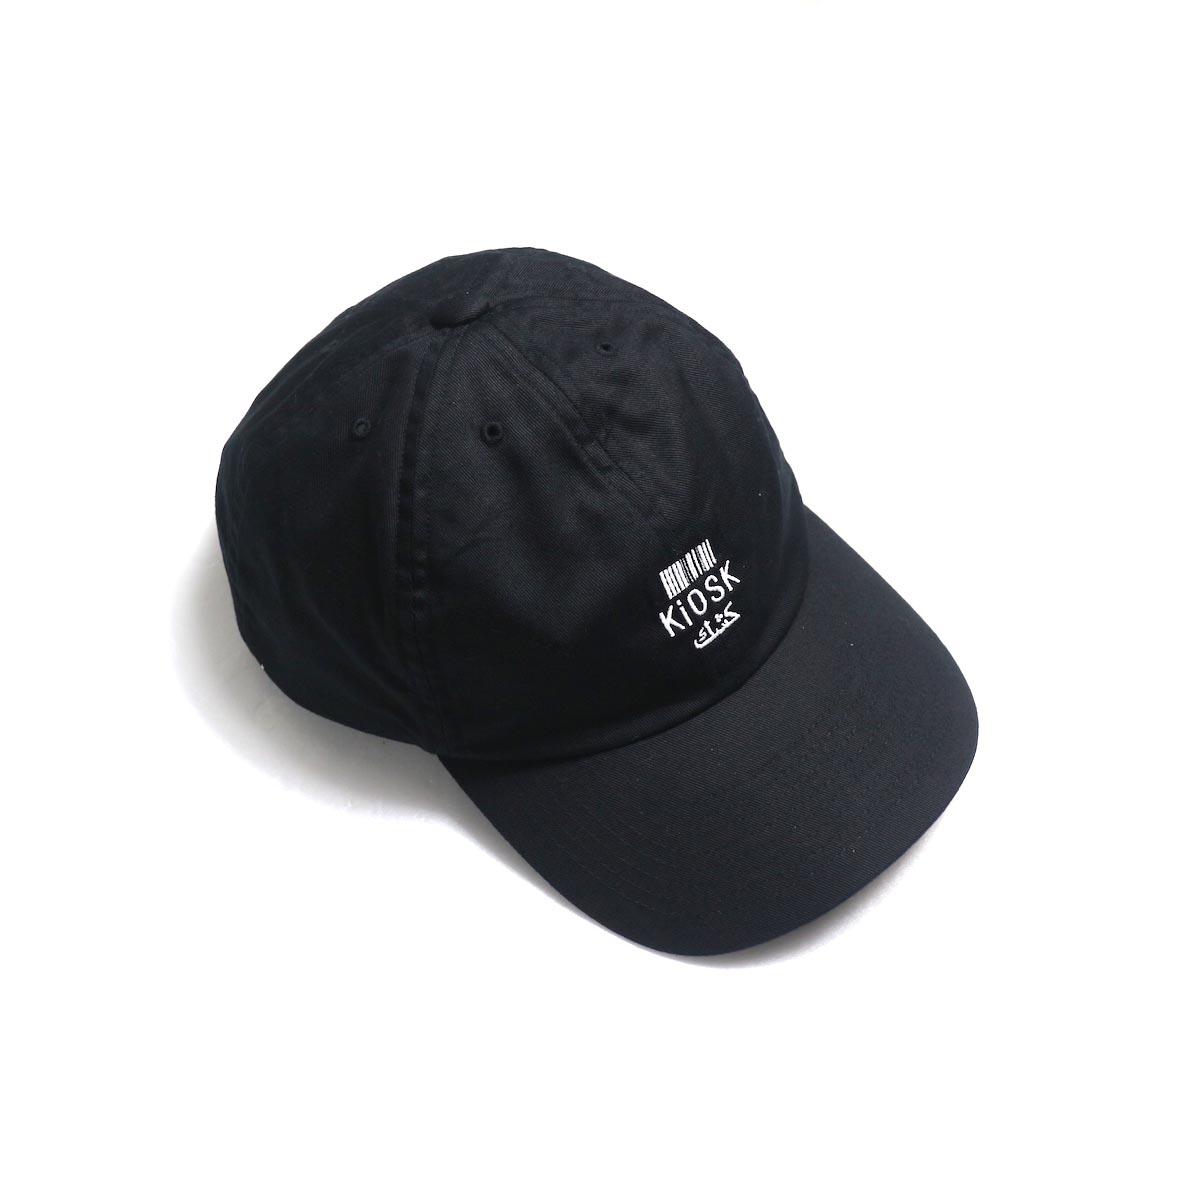 COMESANDGOES / Embroidery Cap (NO.14520) black